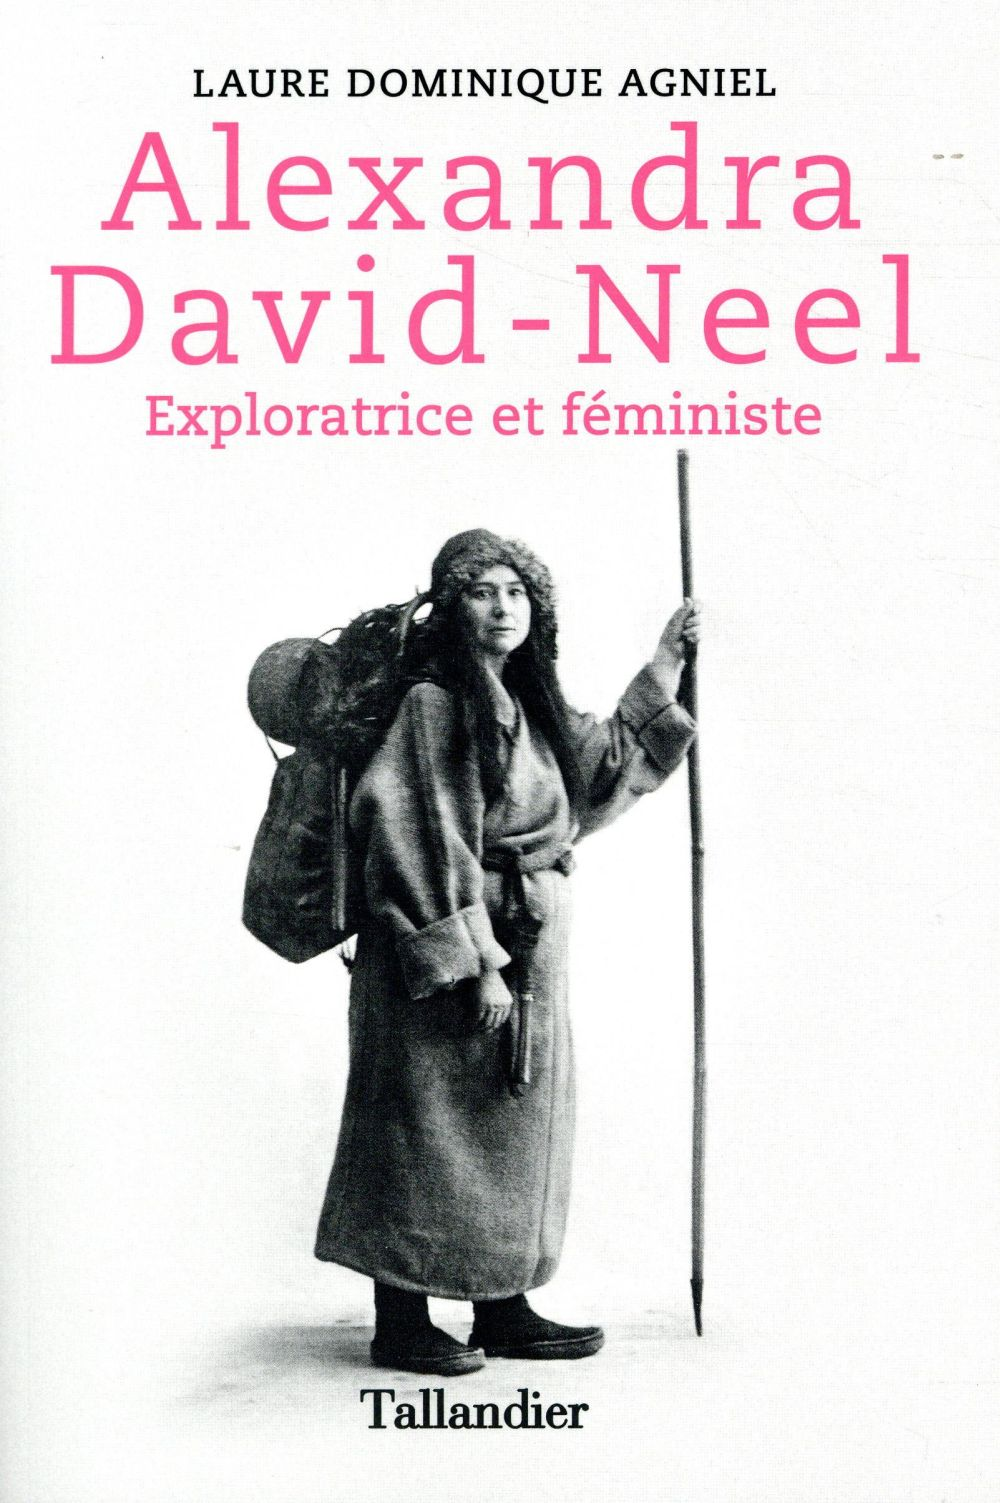 Alexandra David-Néel ; exploratrice et féministe